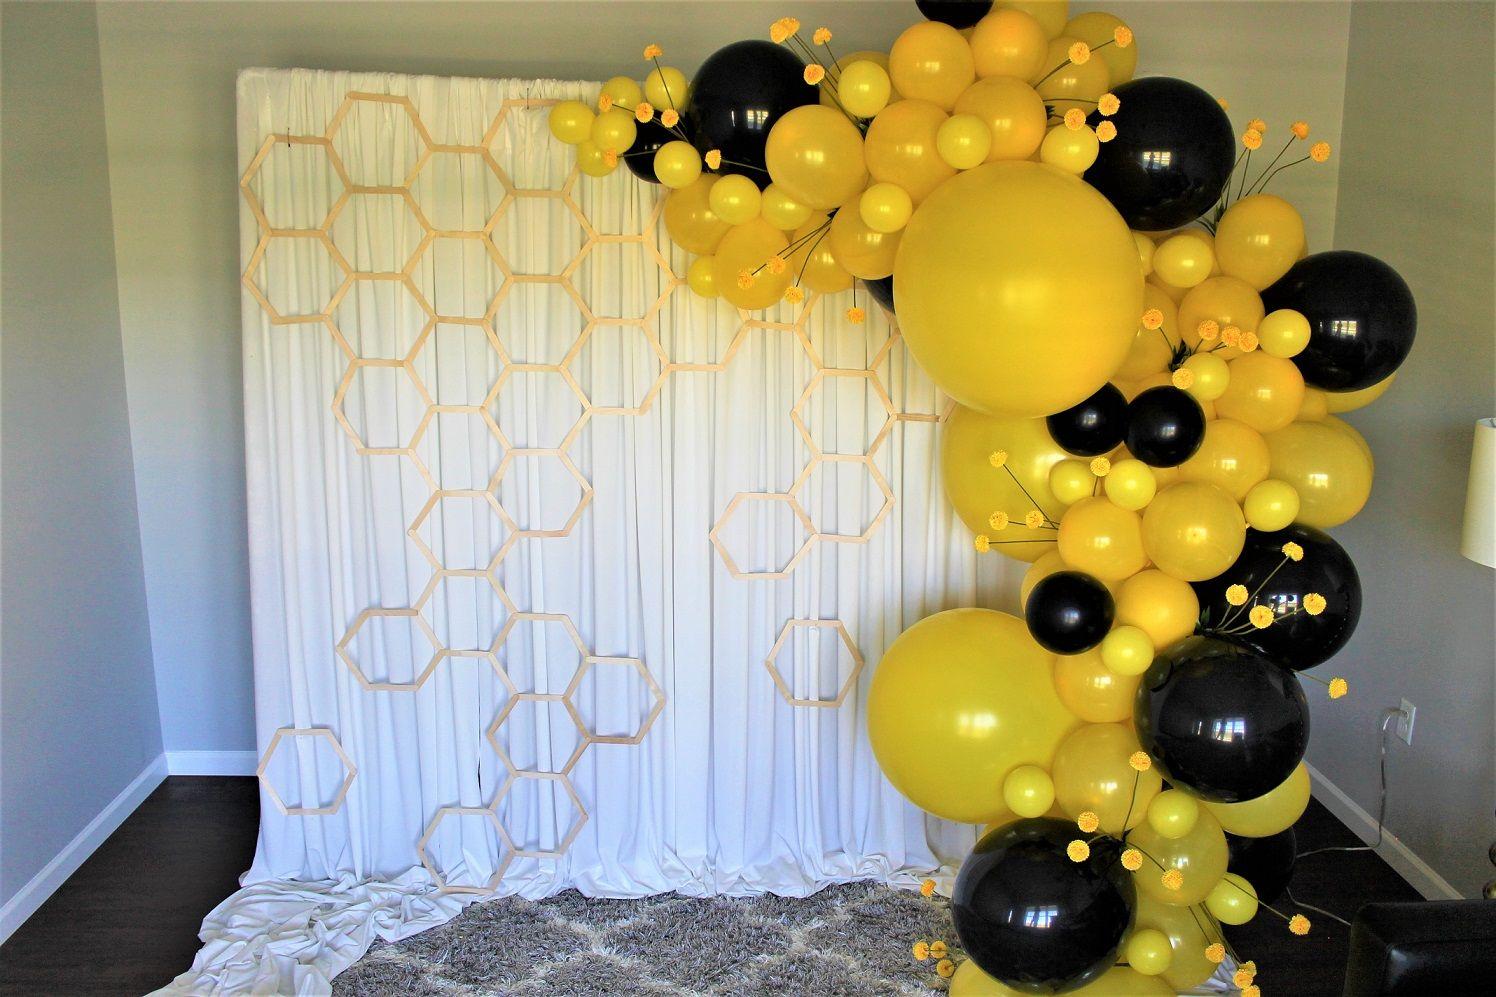 By Balloon Art By Merry Makers Decor Balloon Art